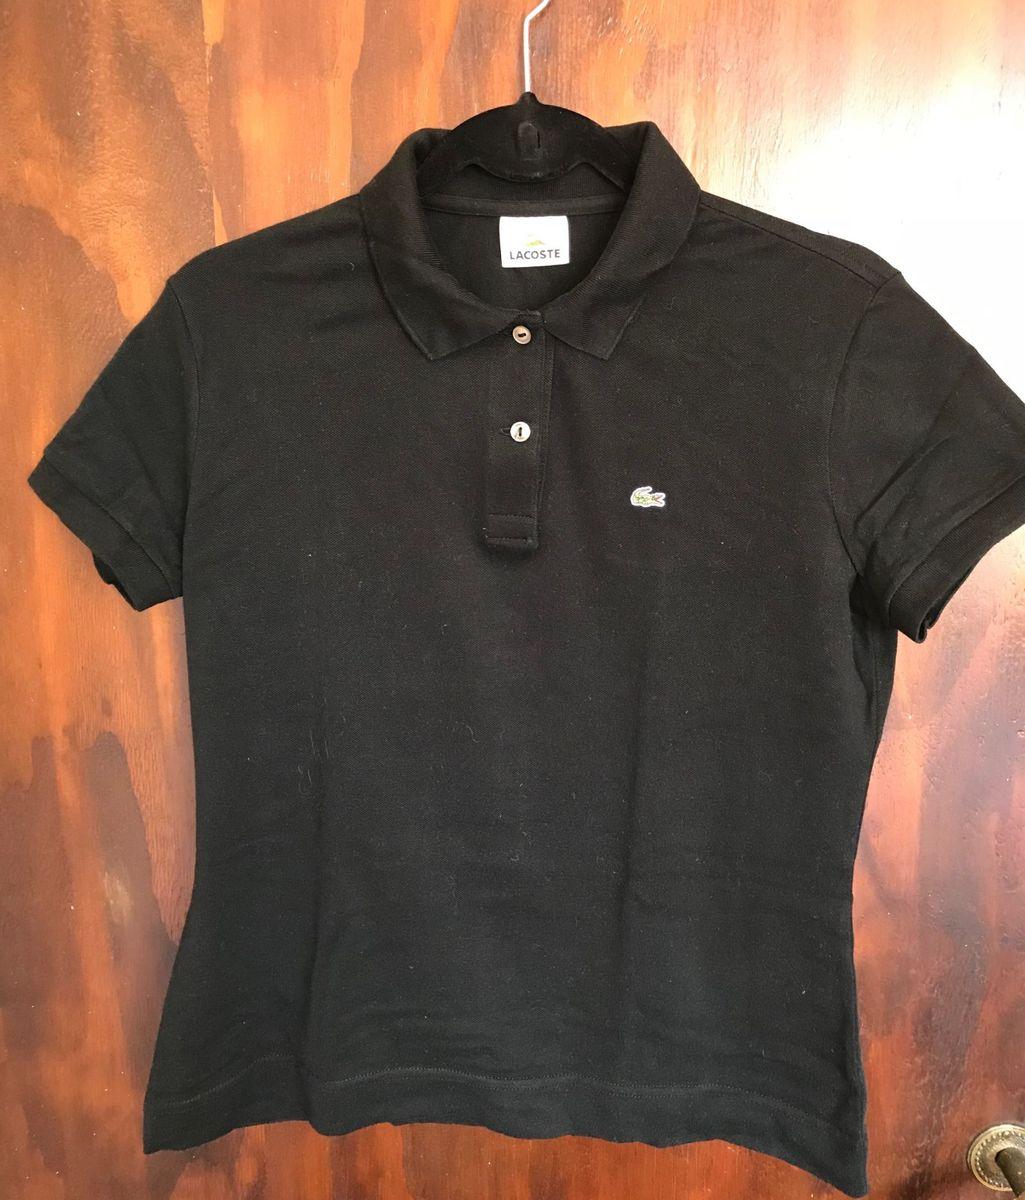 Camisa Polo Lacoste Feminina Preta   Camisa Feminina Lacoste Usado ... 543c1213e7